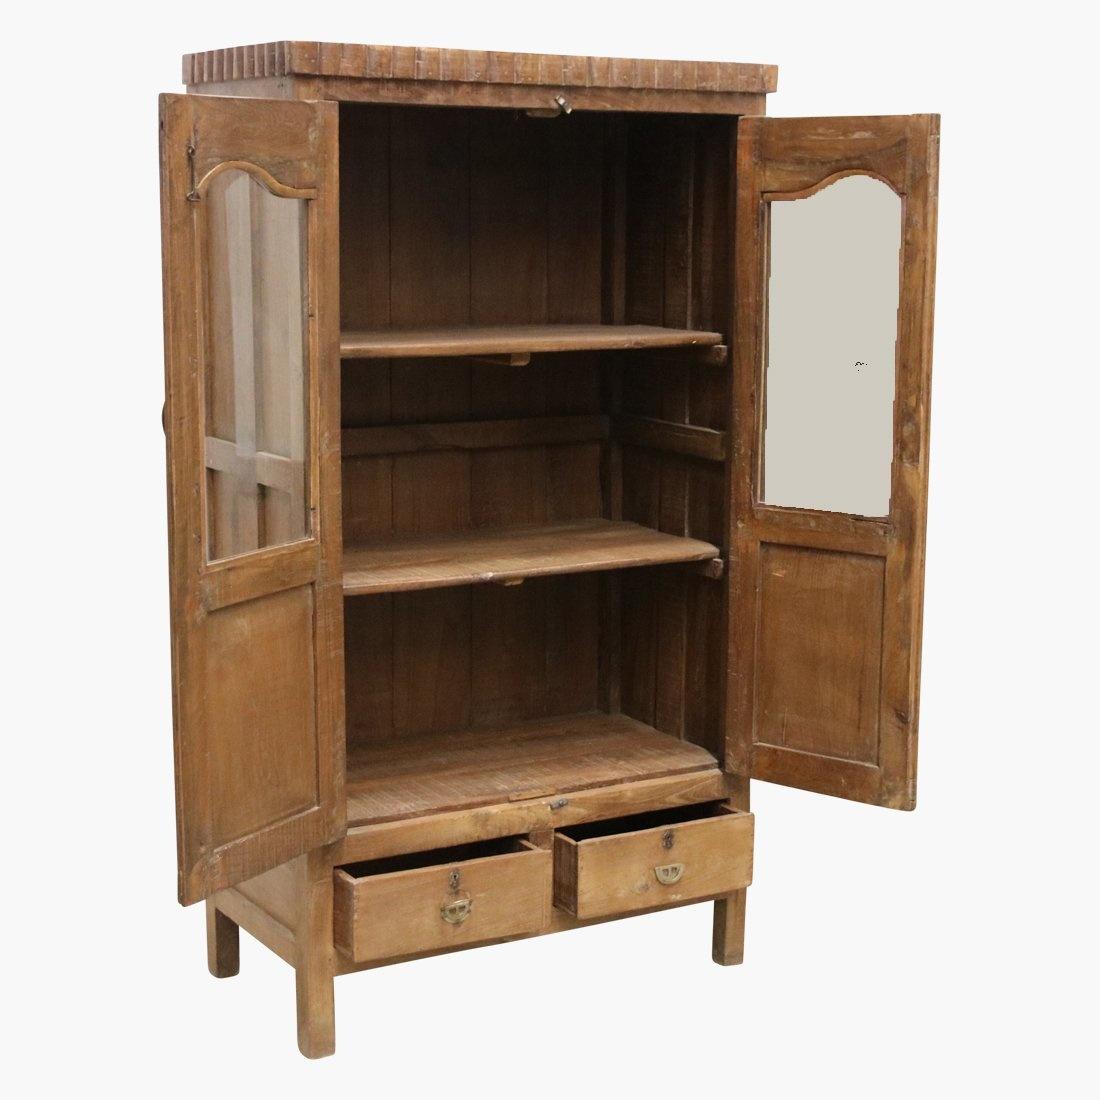 Petite Lily Interiors Cabinet India - wood - 91x56xh172cm - Unique Piece